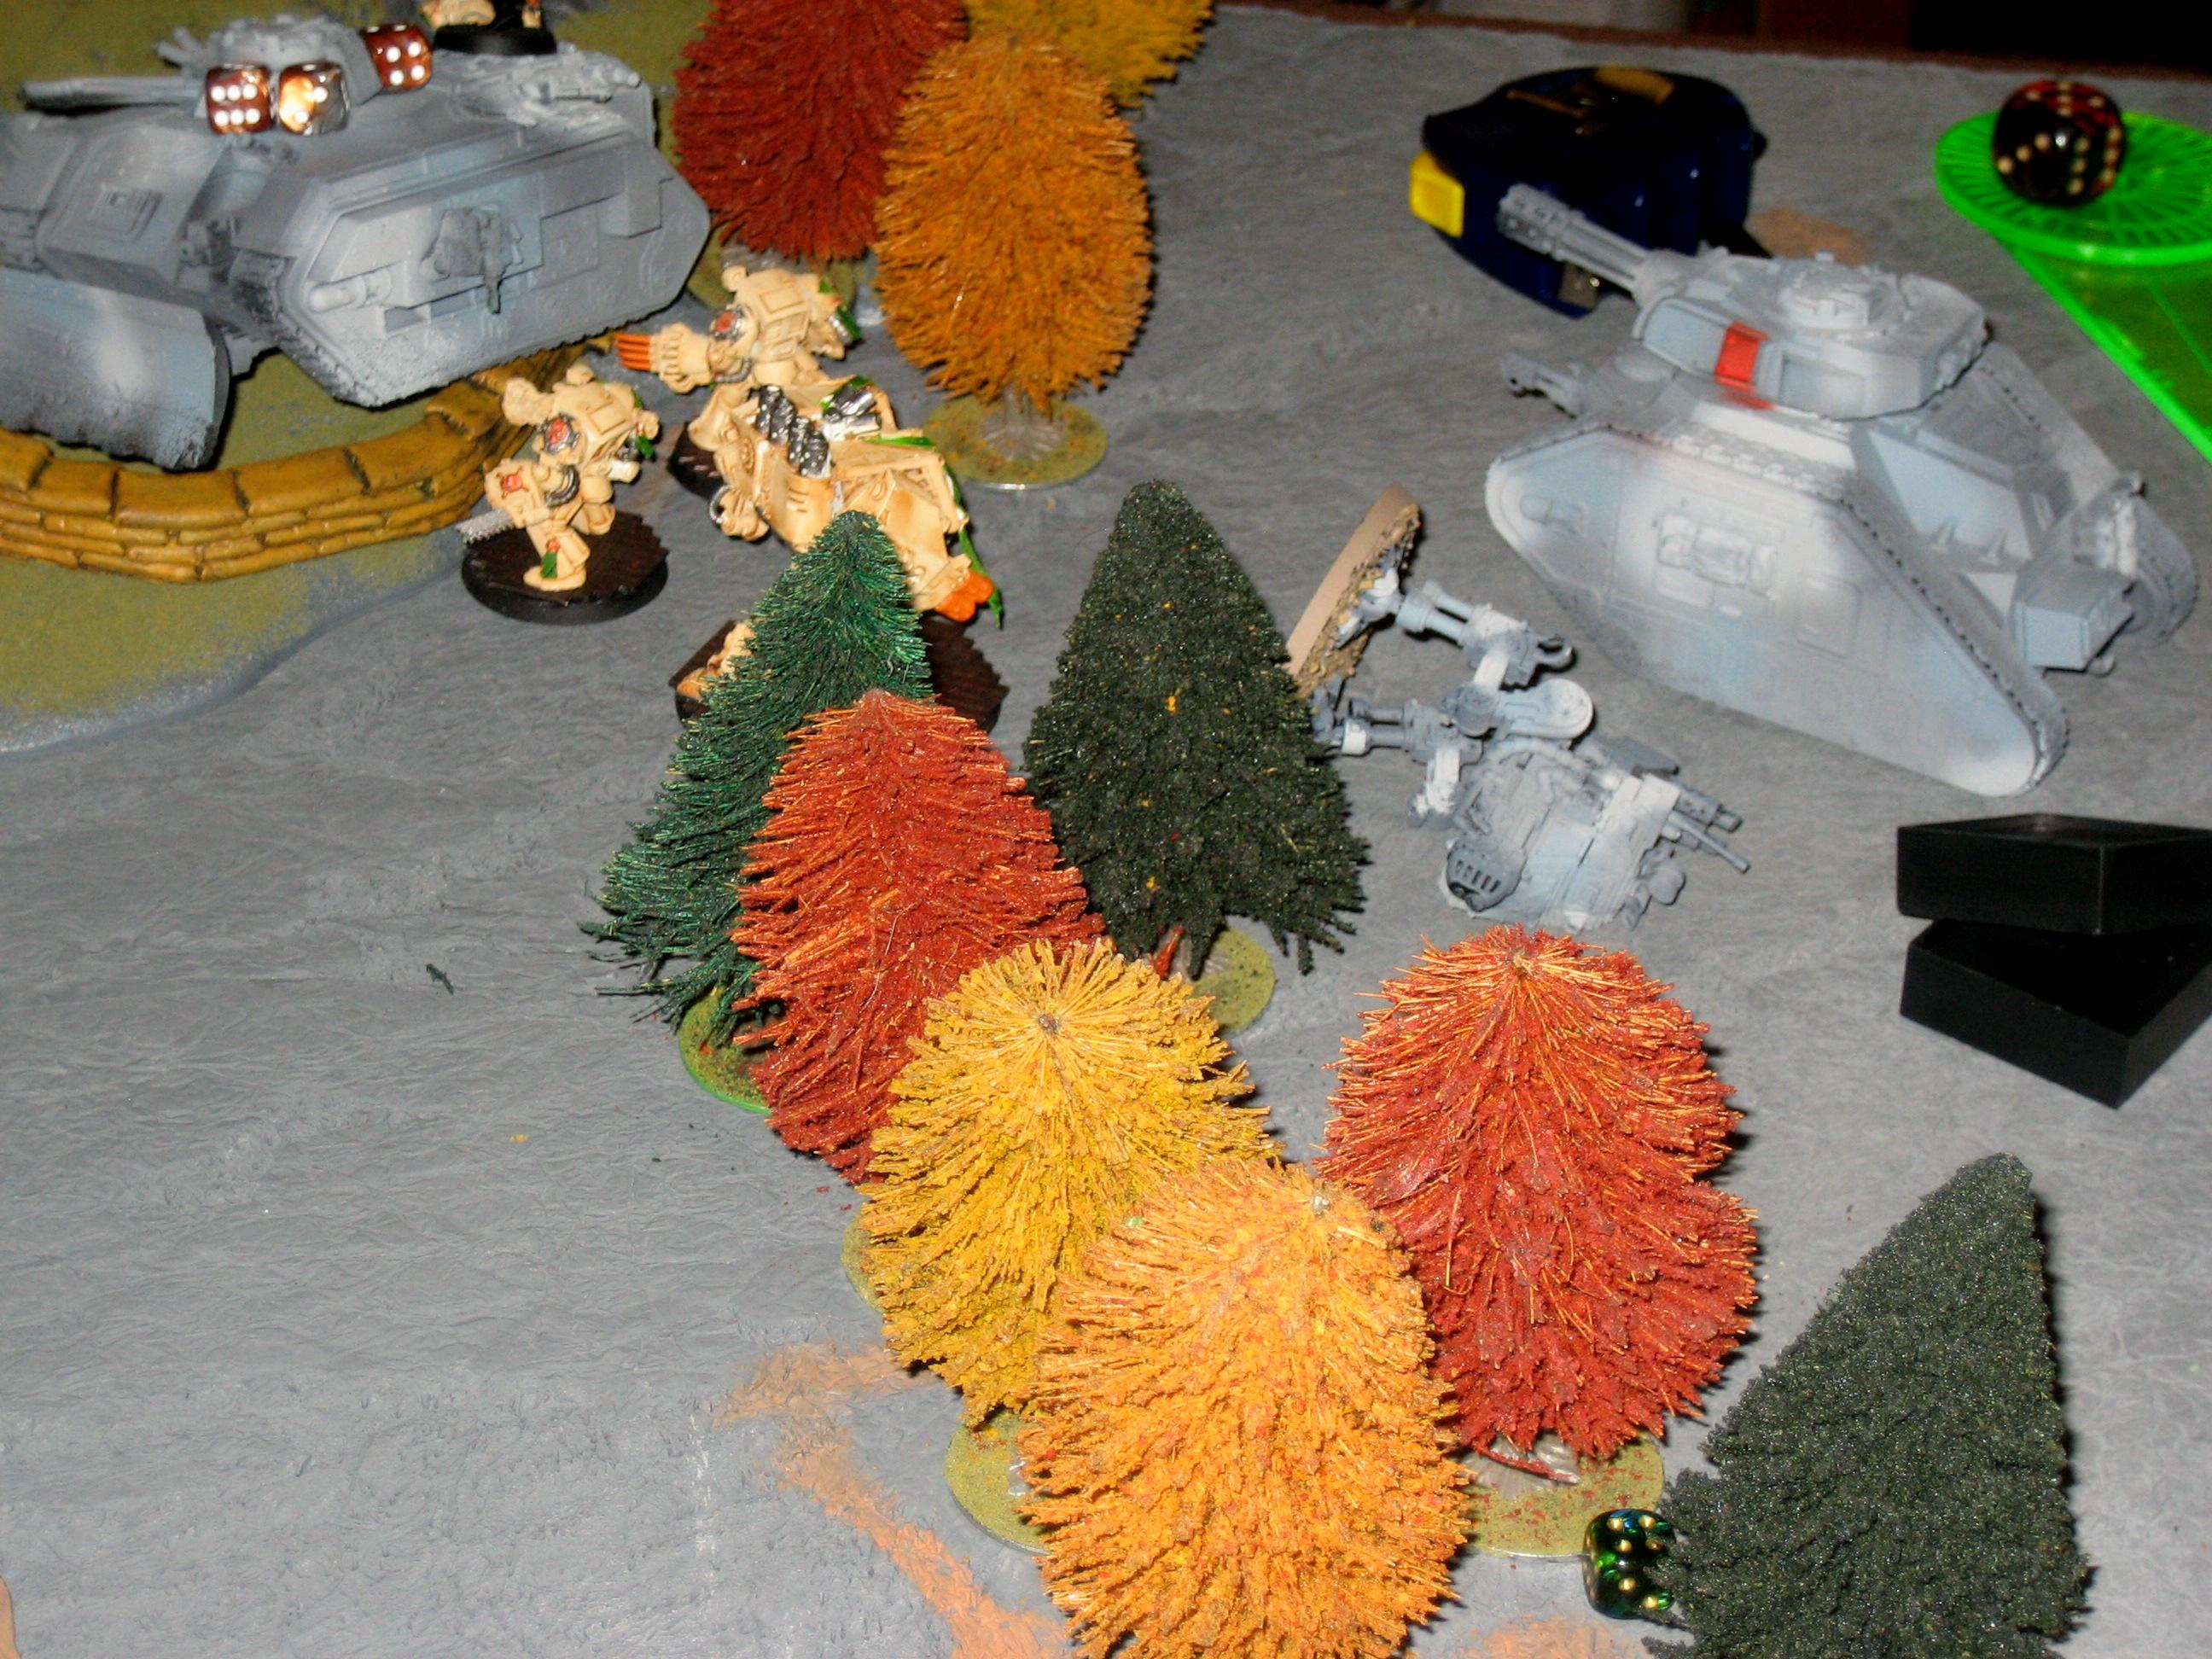 Terminators attacking a chimera